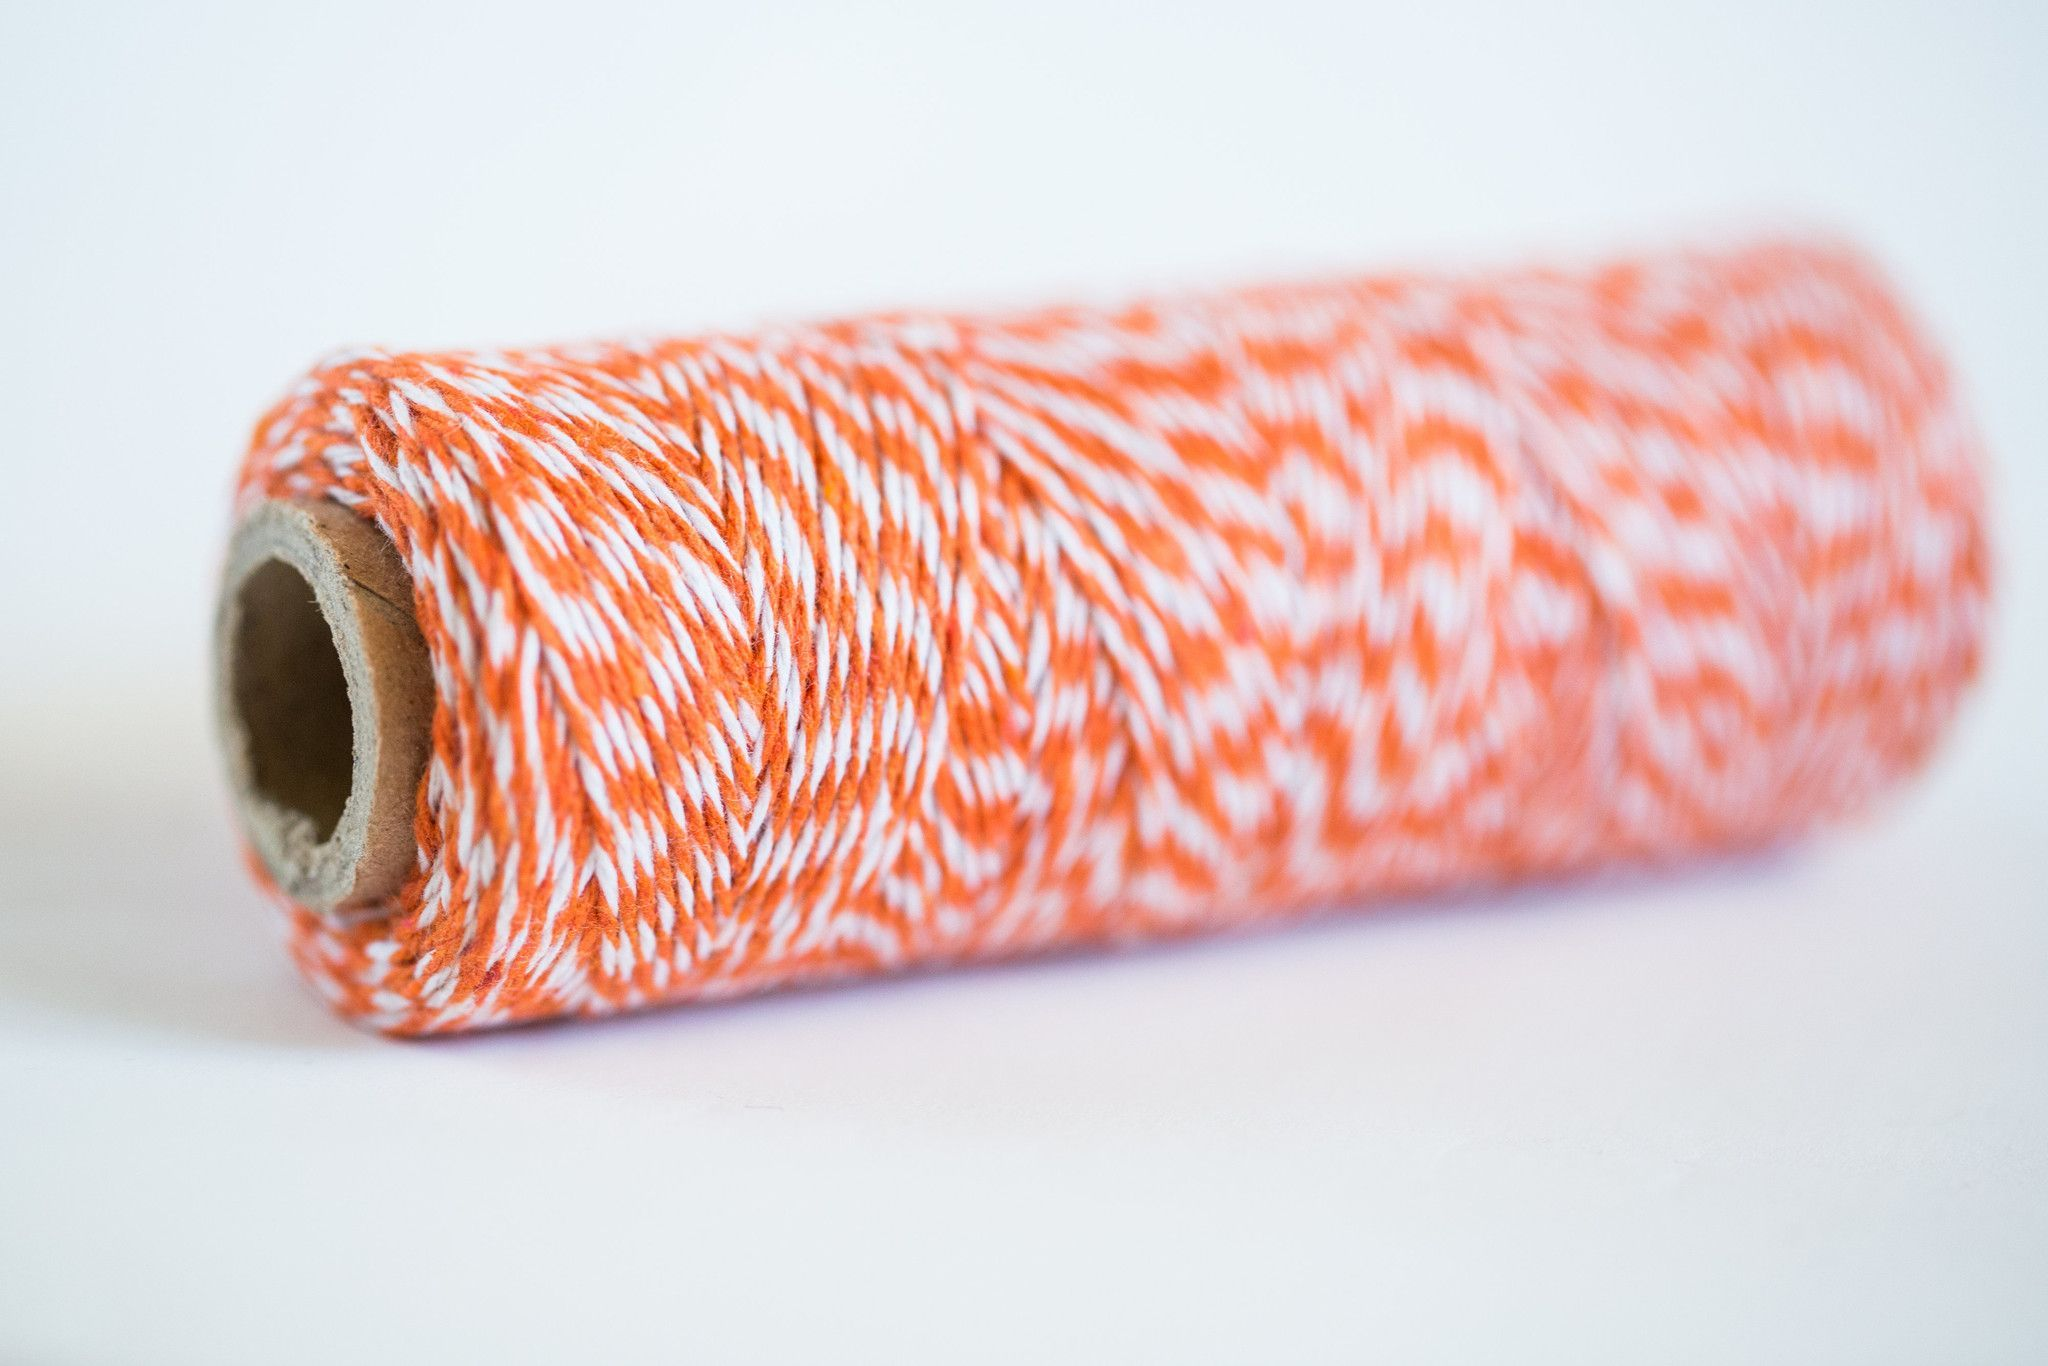 Orange Baker's Twine - 4 ply Cotton String 100 yards